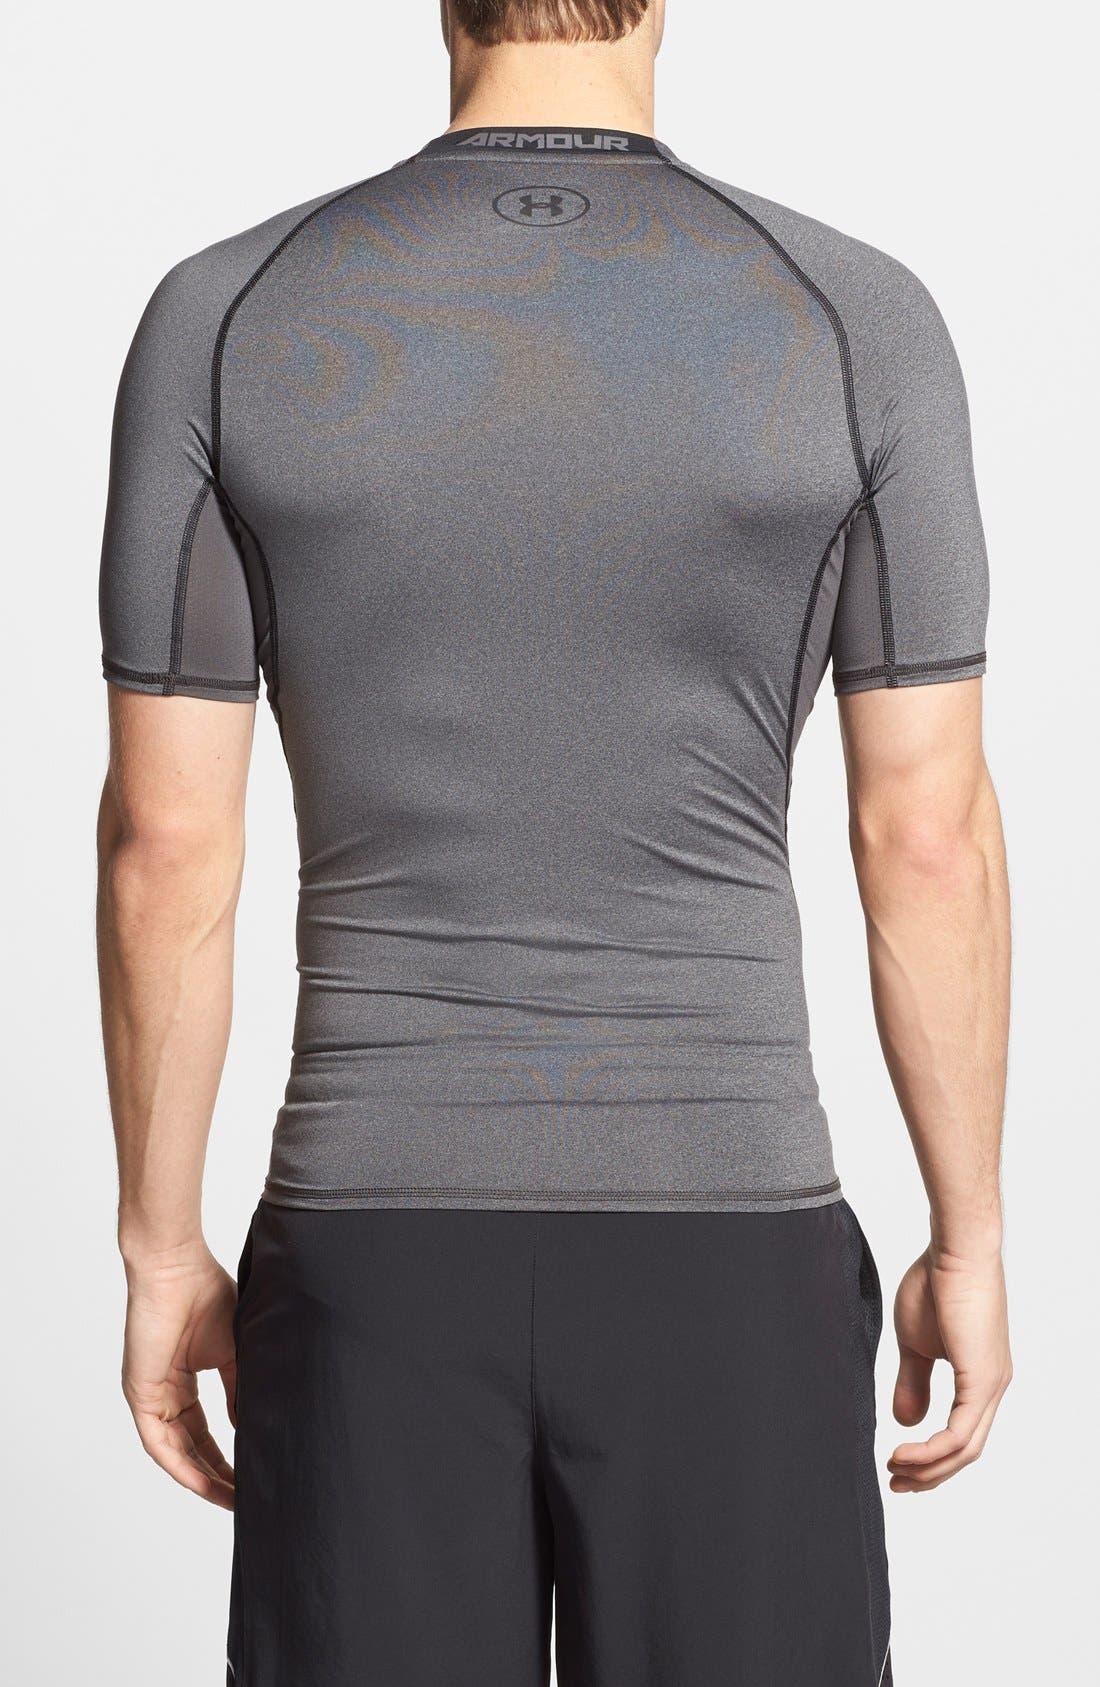 HeatGear<sup>®</sup> Compression Fit T-Shirt,                             Alternate thumbnail 8, color,                             CARBON HEATHER/ BLACK